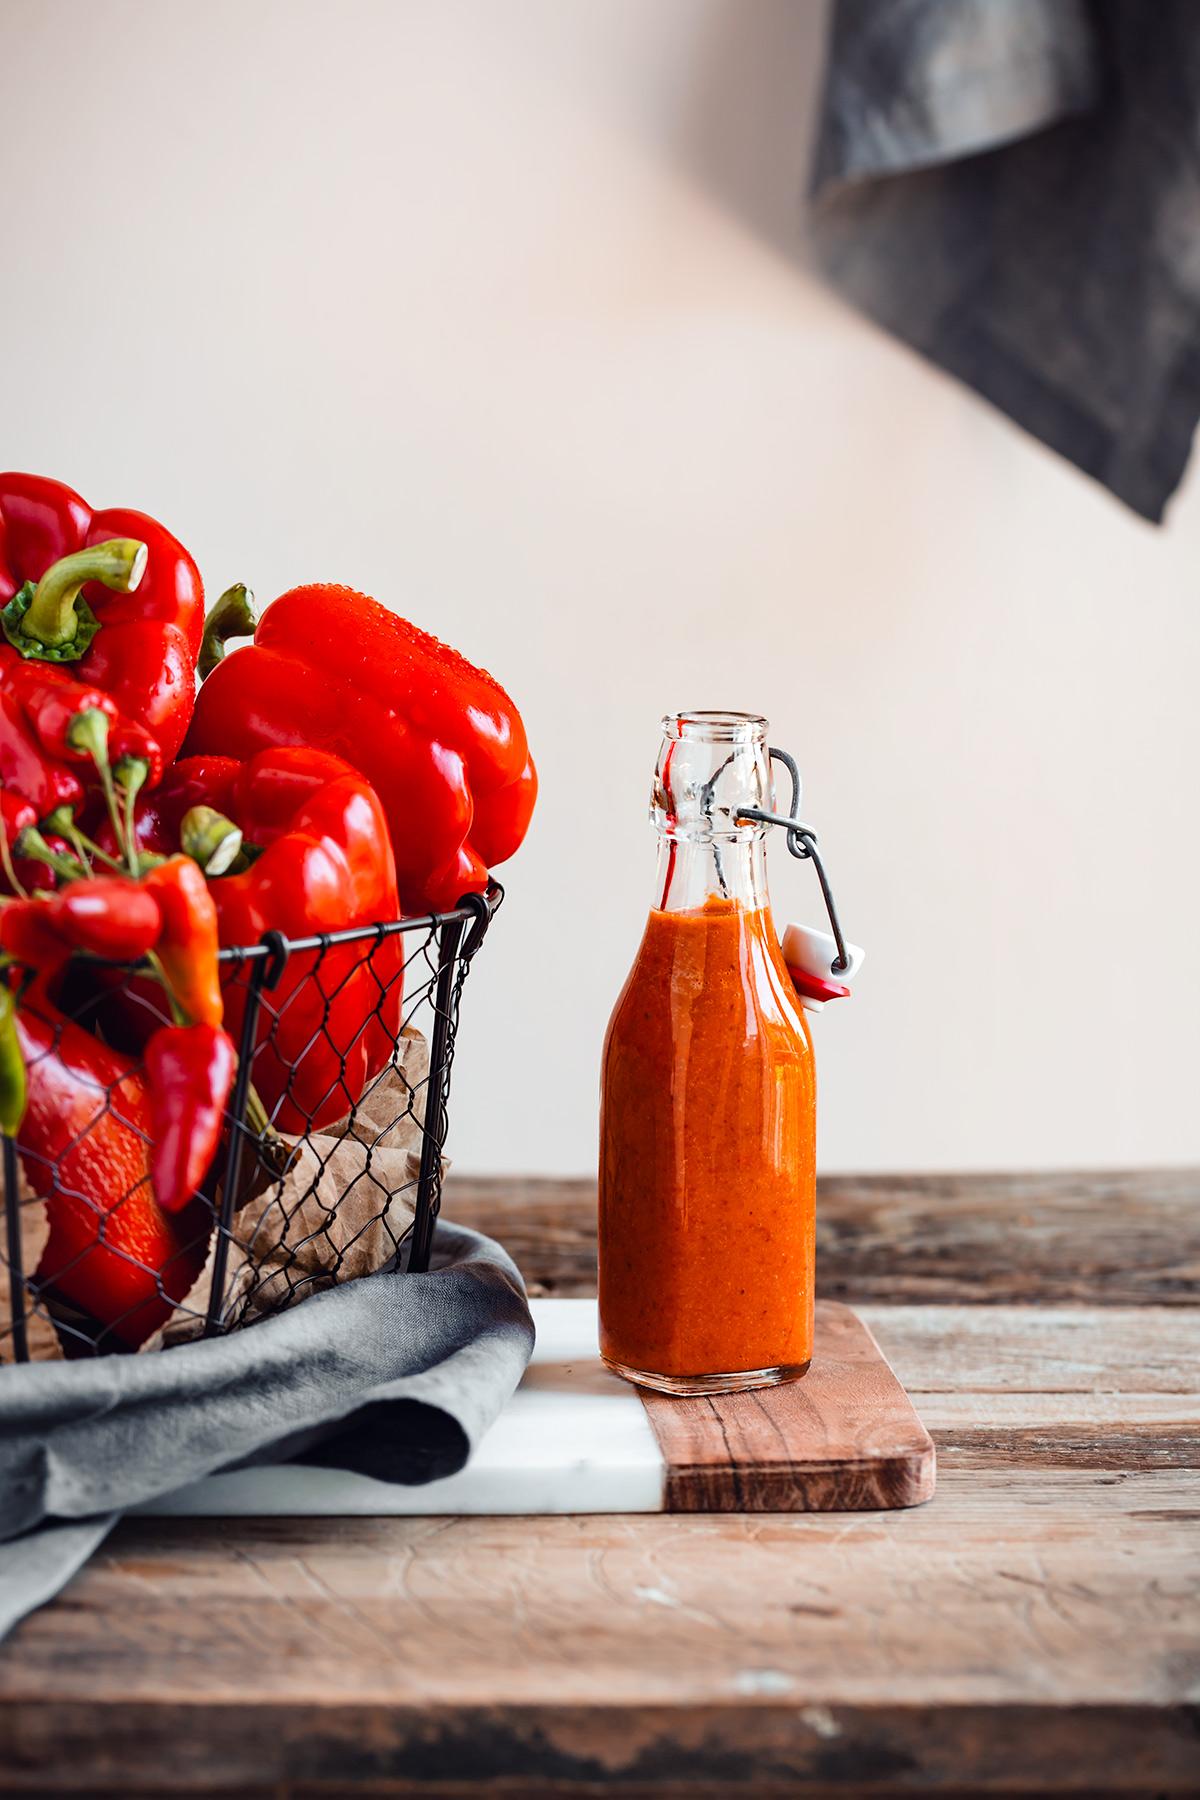 ricetta pasta conSALSA ai PEPERONI arrostiti creamy vegan ROASTED RED PEPPER PASTA SAUCE recipe